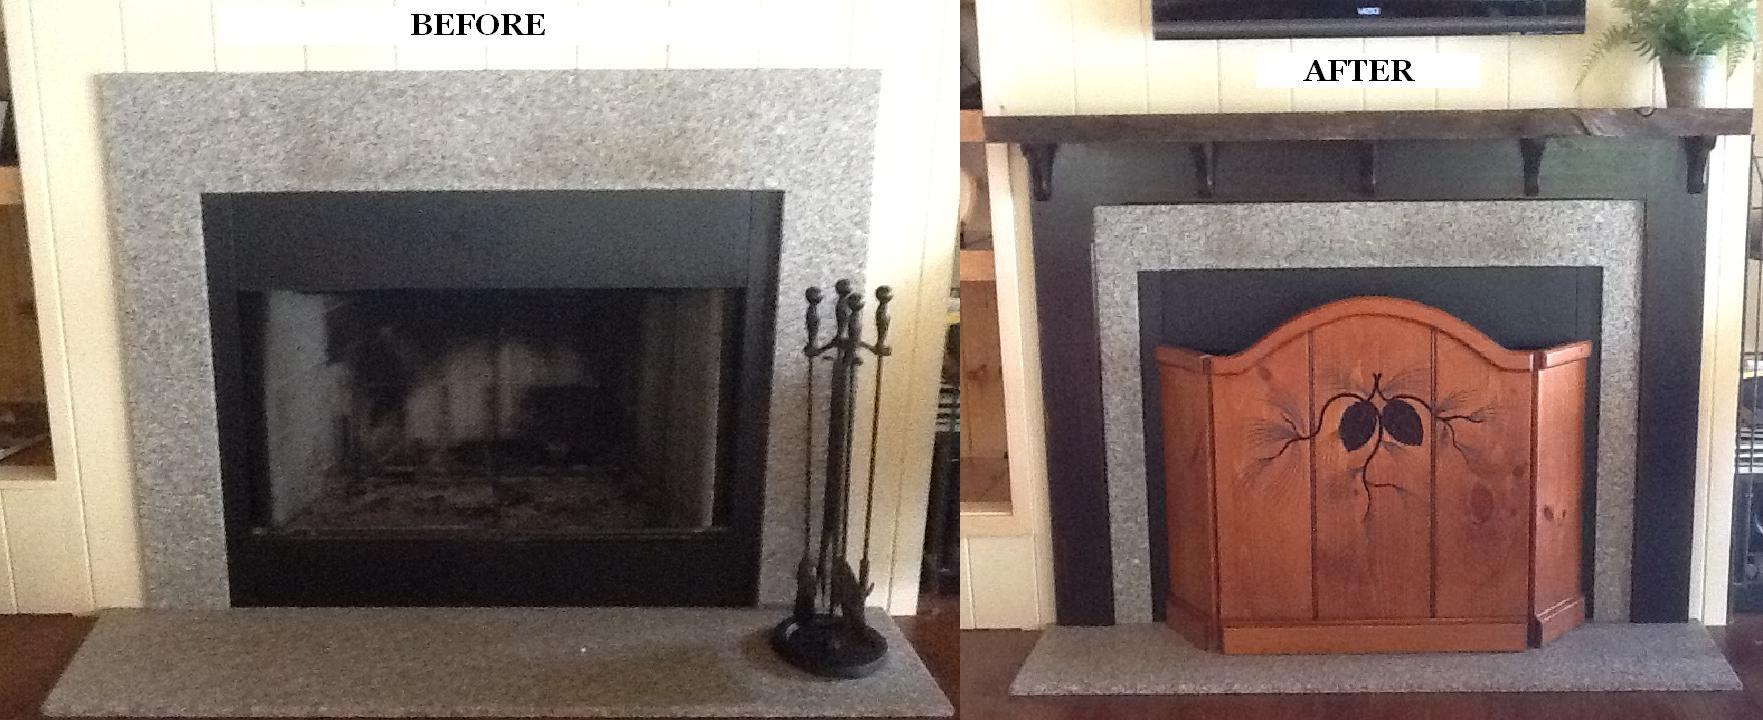 Custom Mantel To Soften A Granite Fireplace Surround Granite